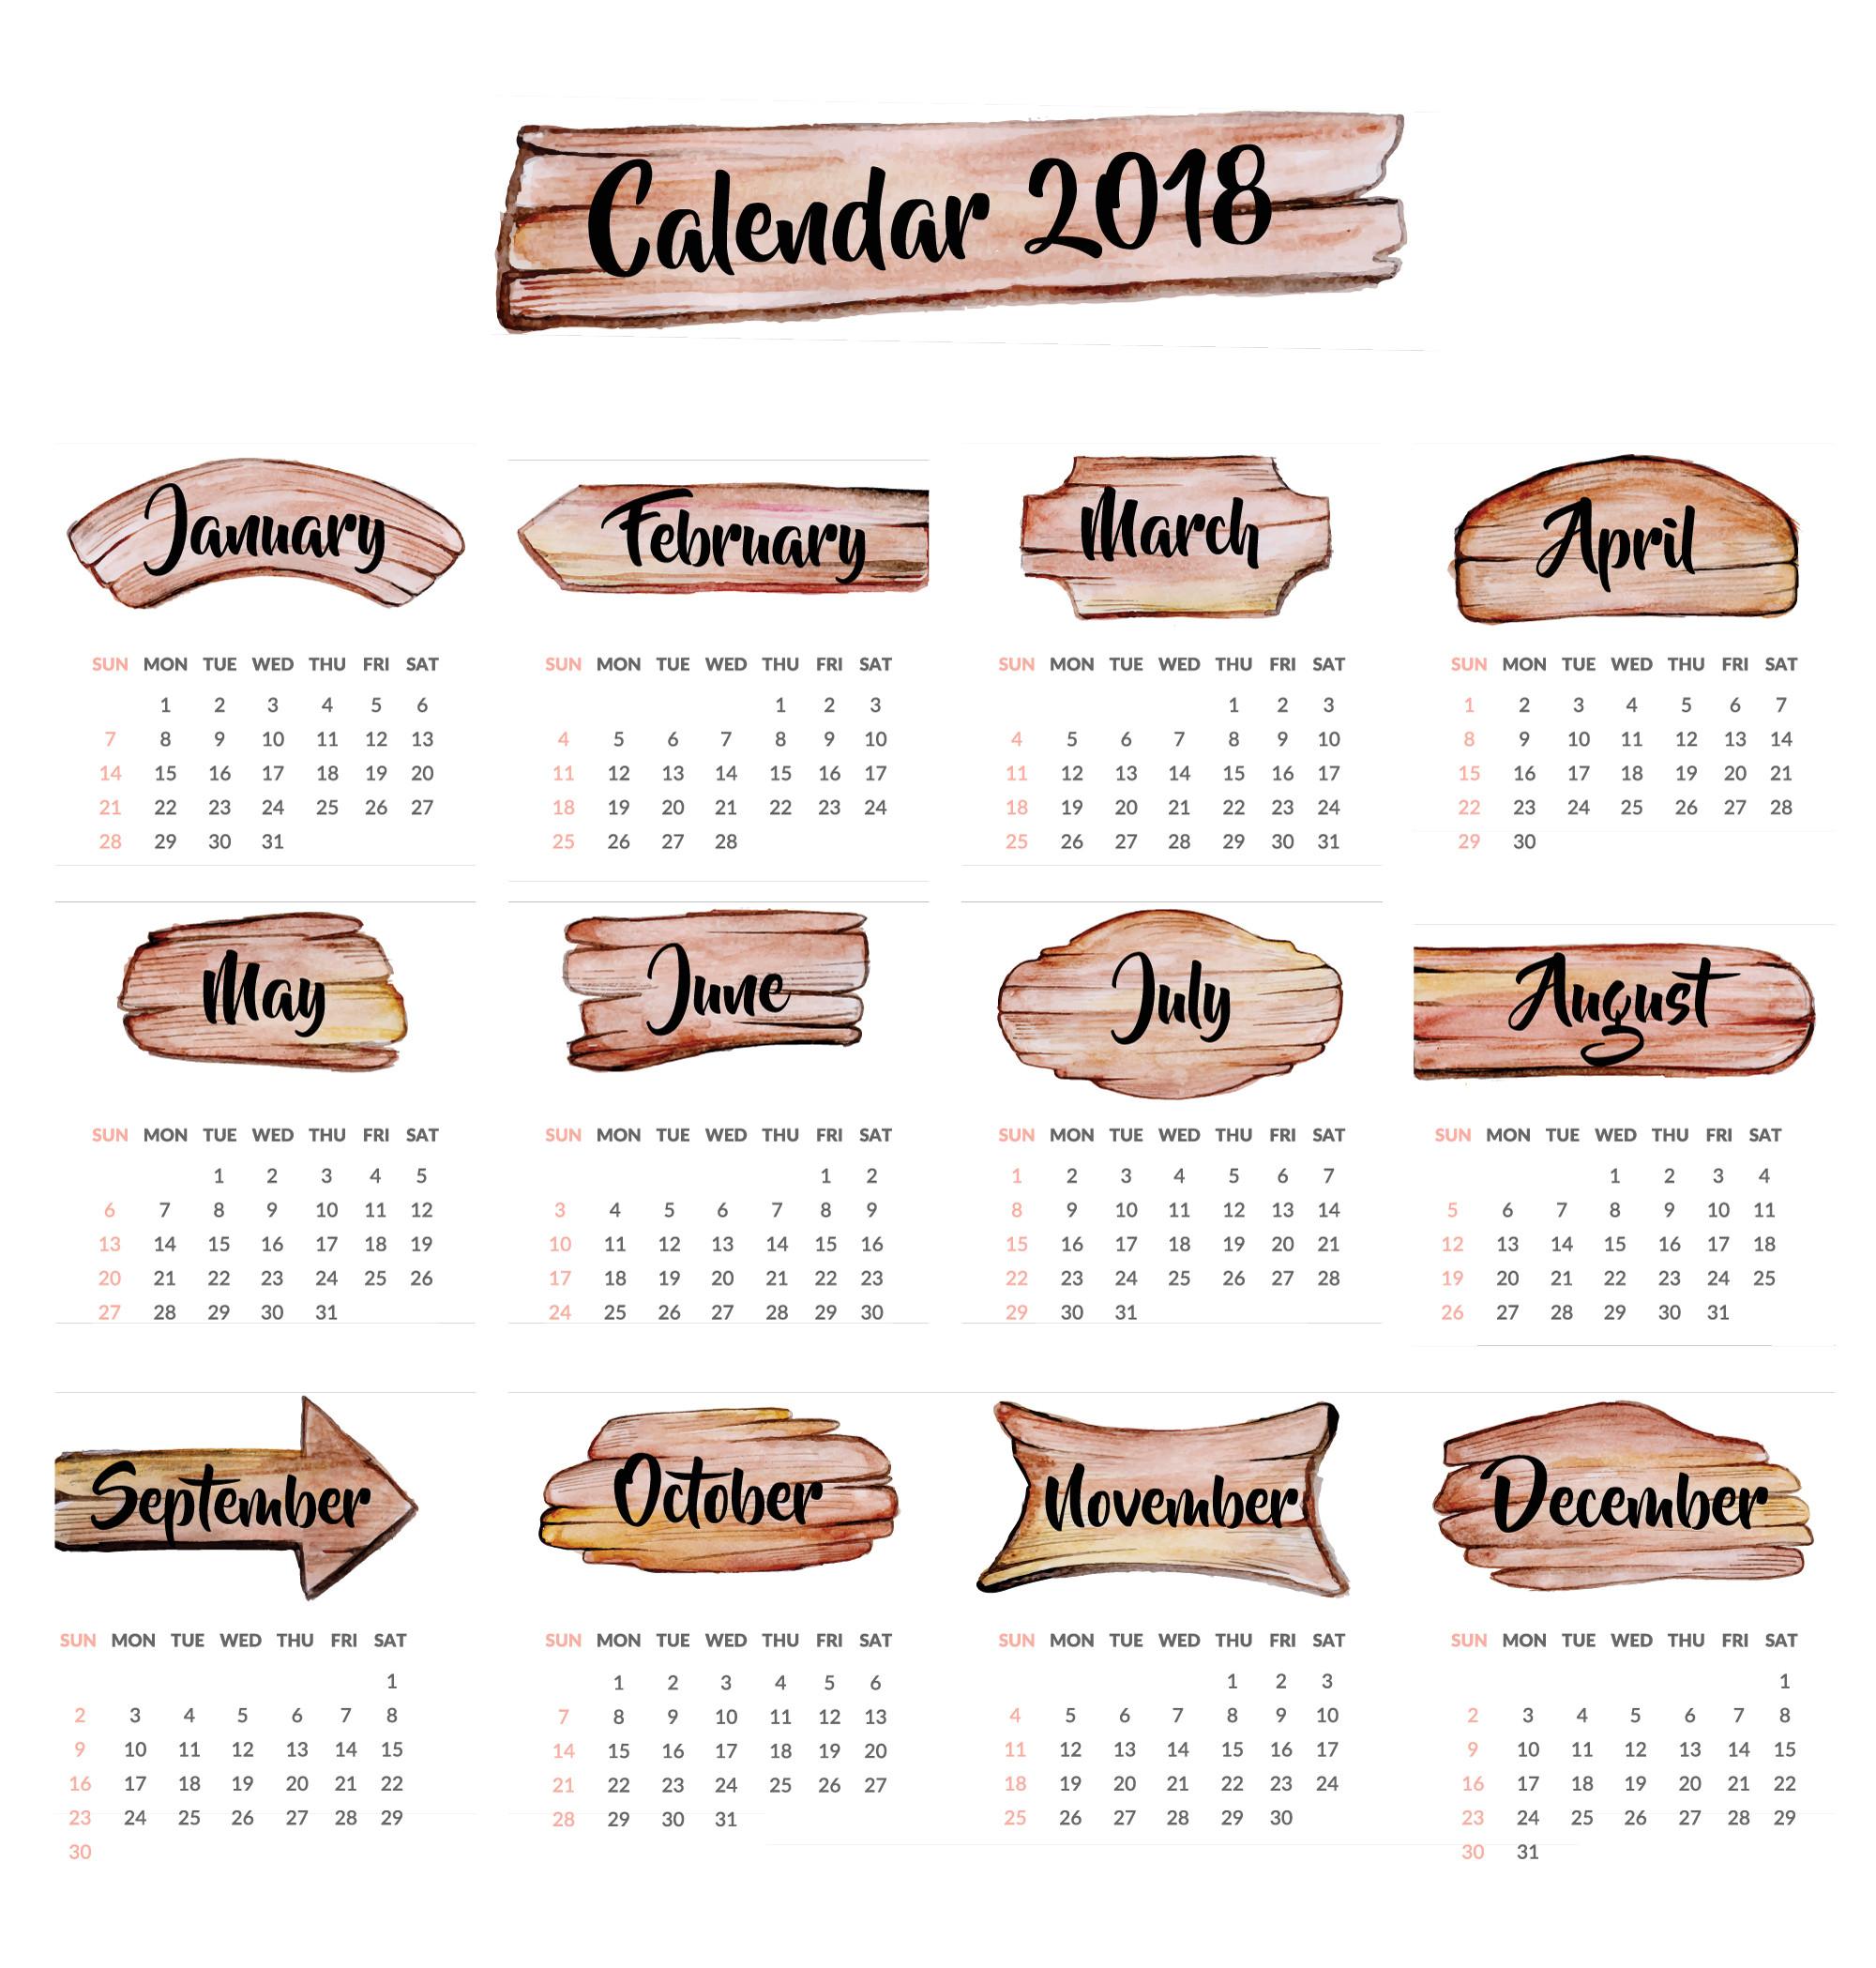 Weekly Calendar Wallpaper : Wallpapers with calendar ·①